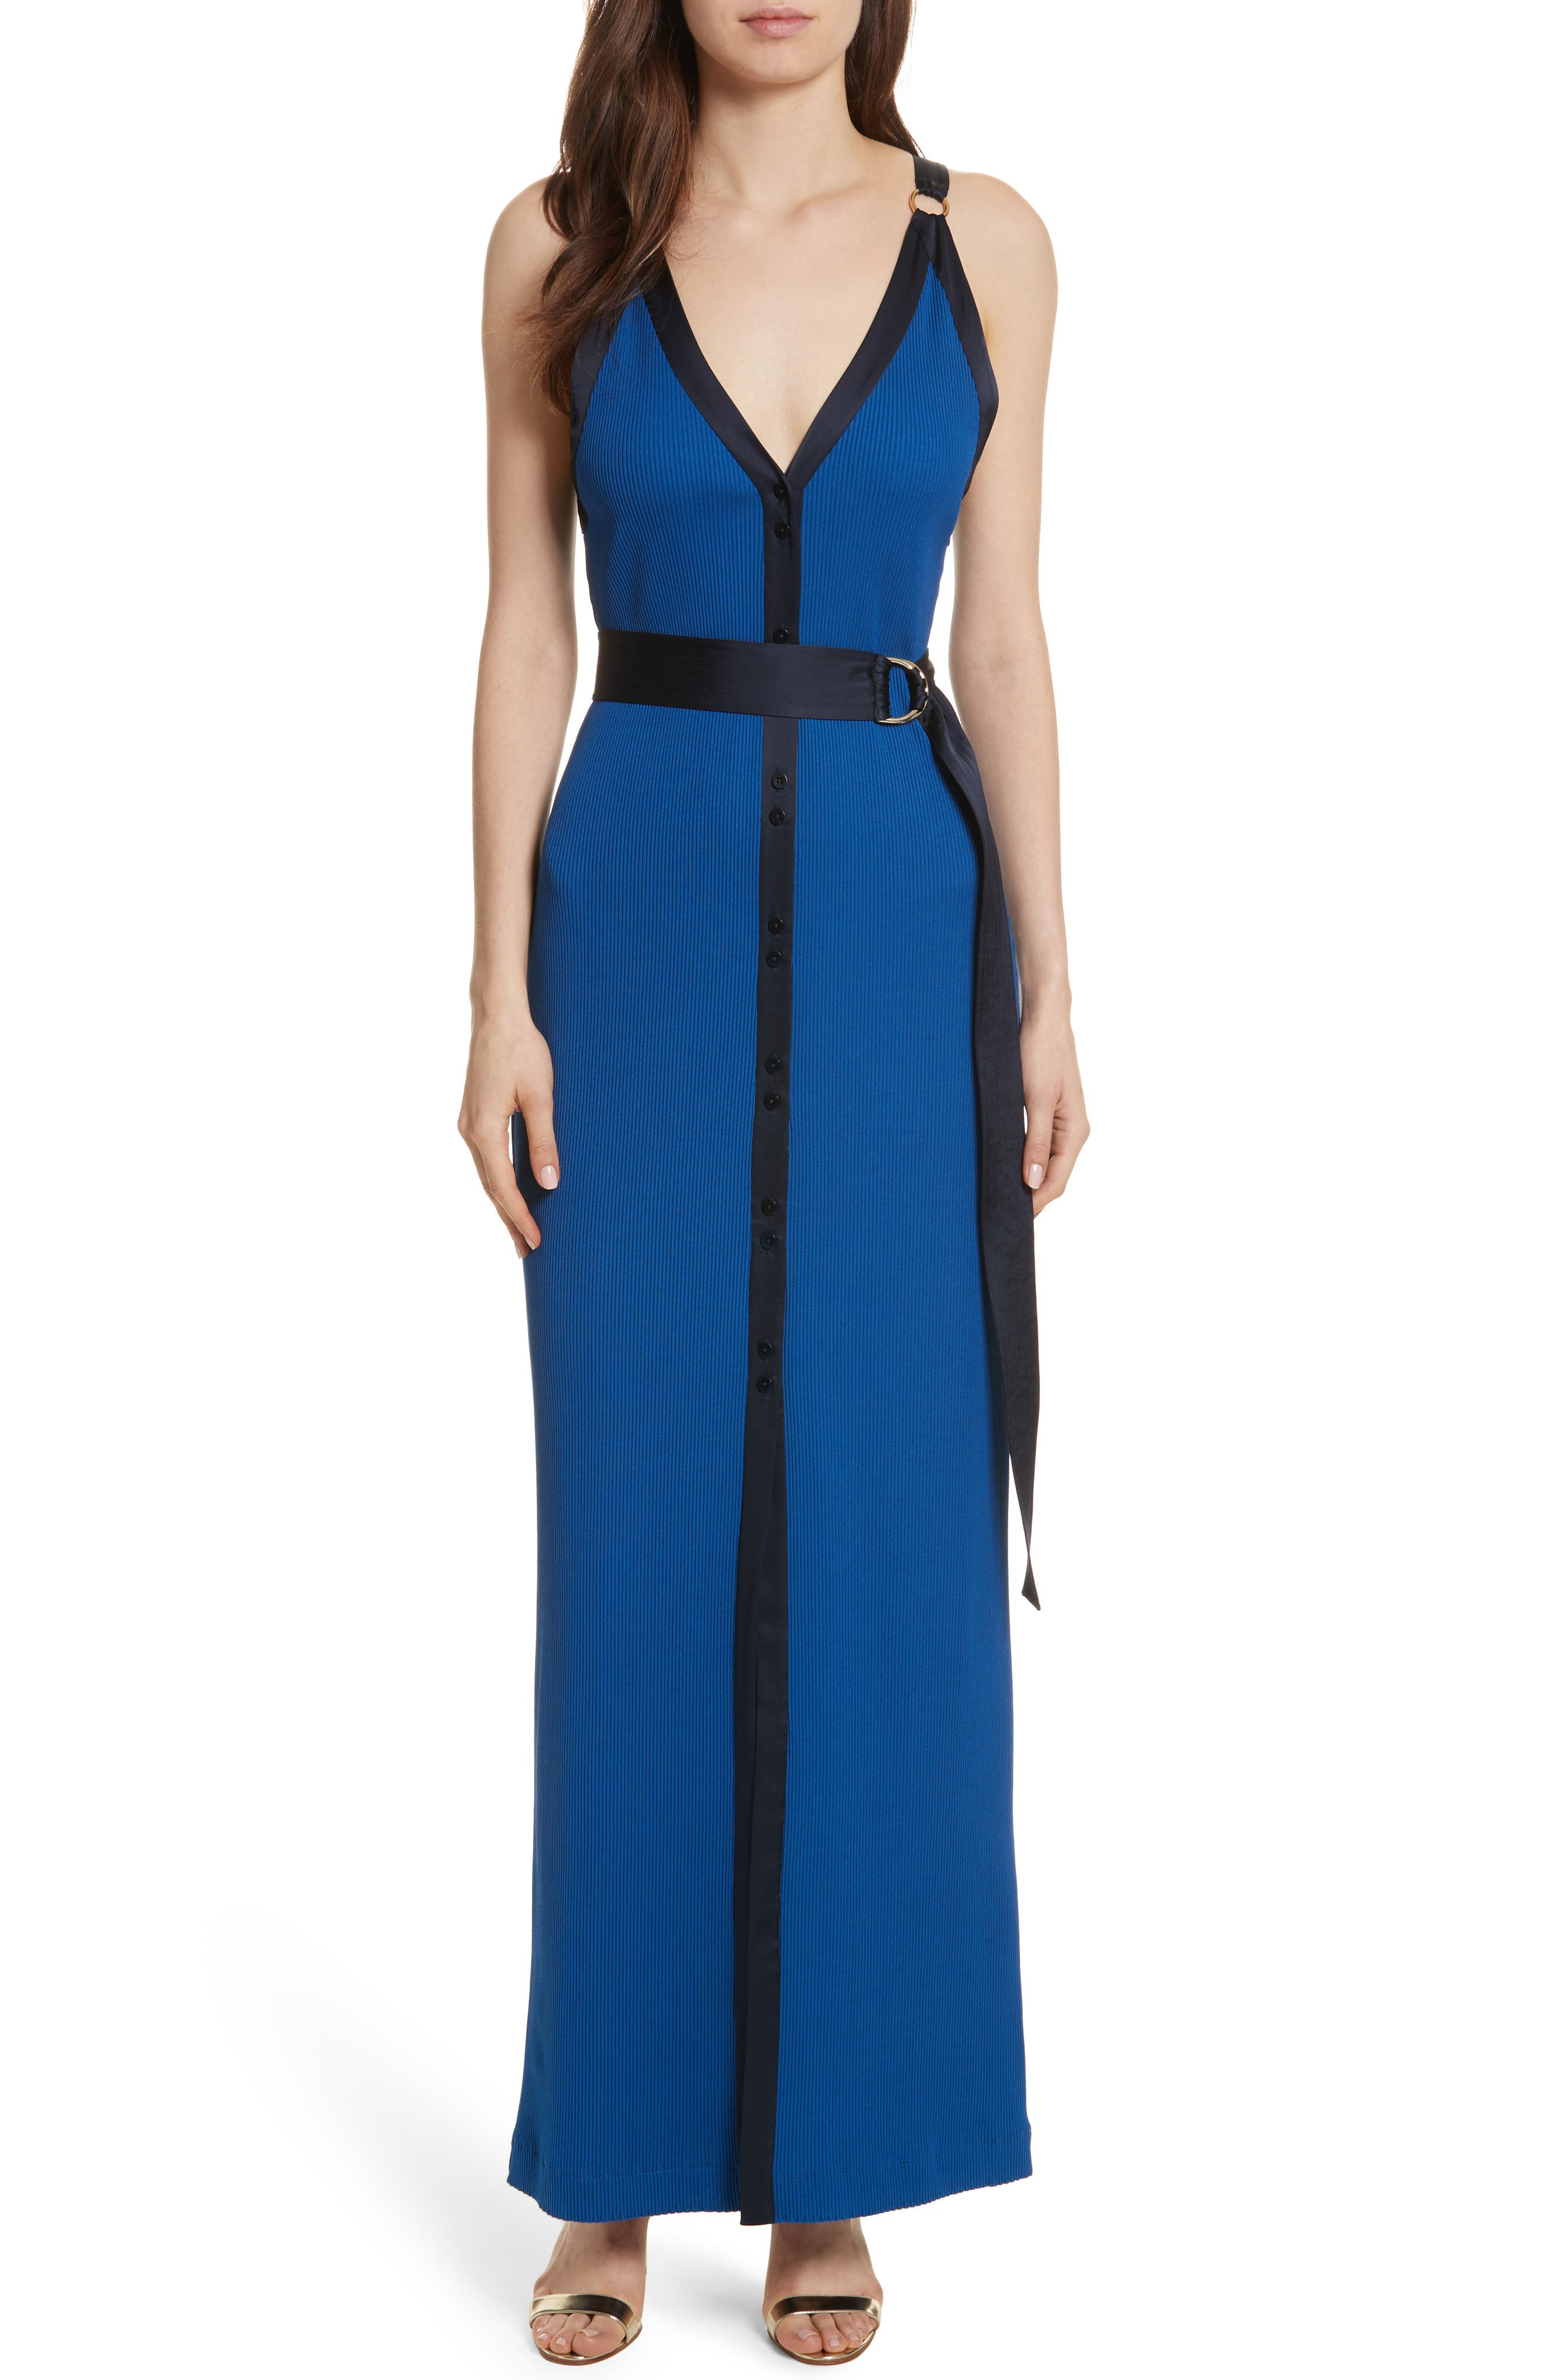 Diane von Furstenberg Ribbed Jersey Maxi Dress,                             Main thumbnail 1, color,                             412